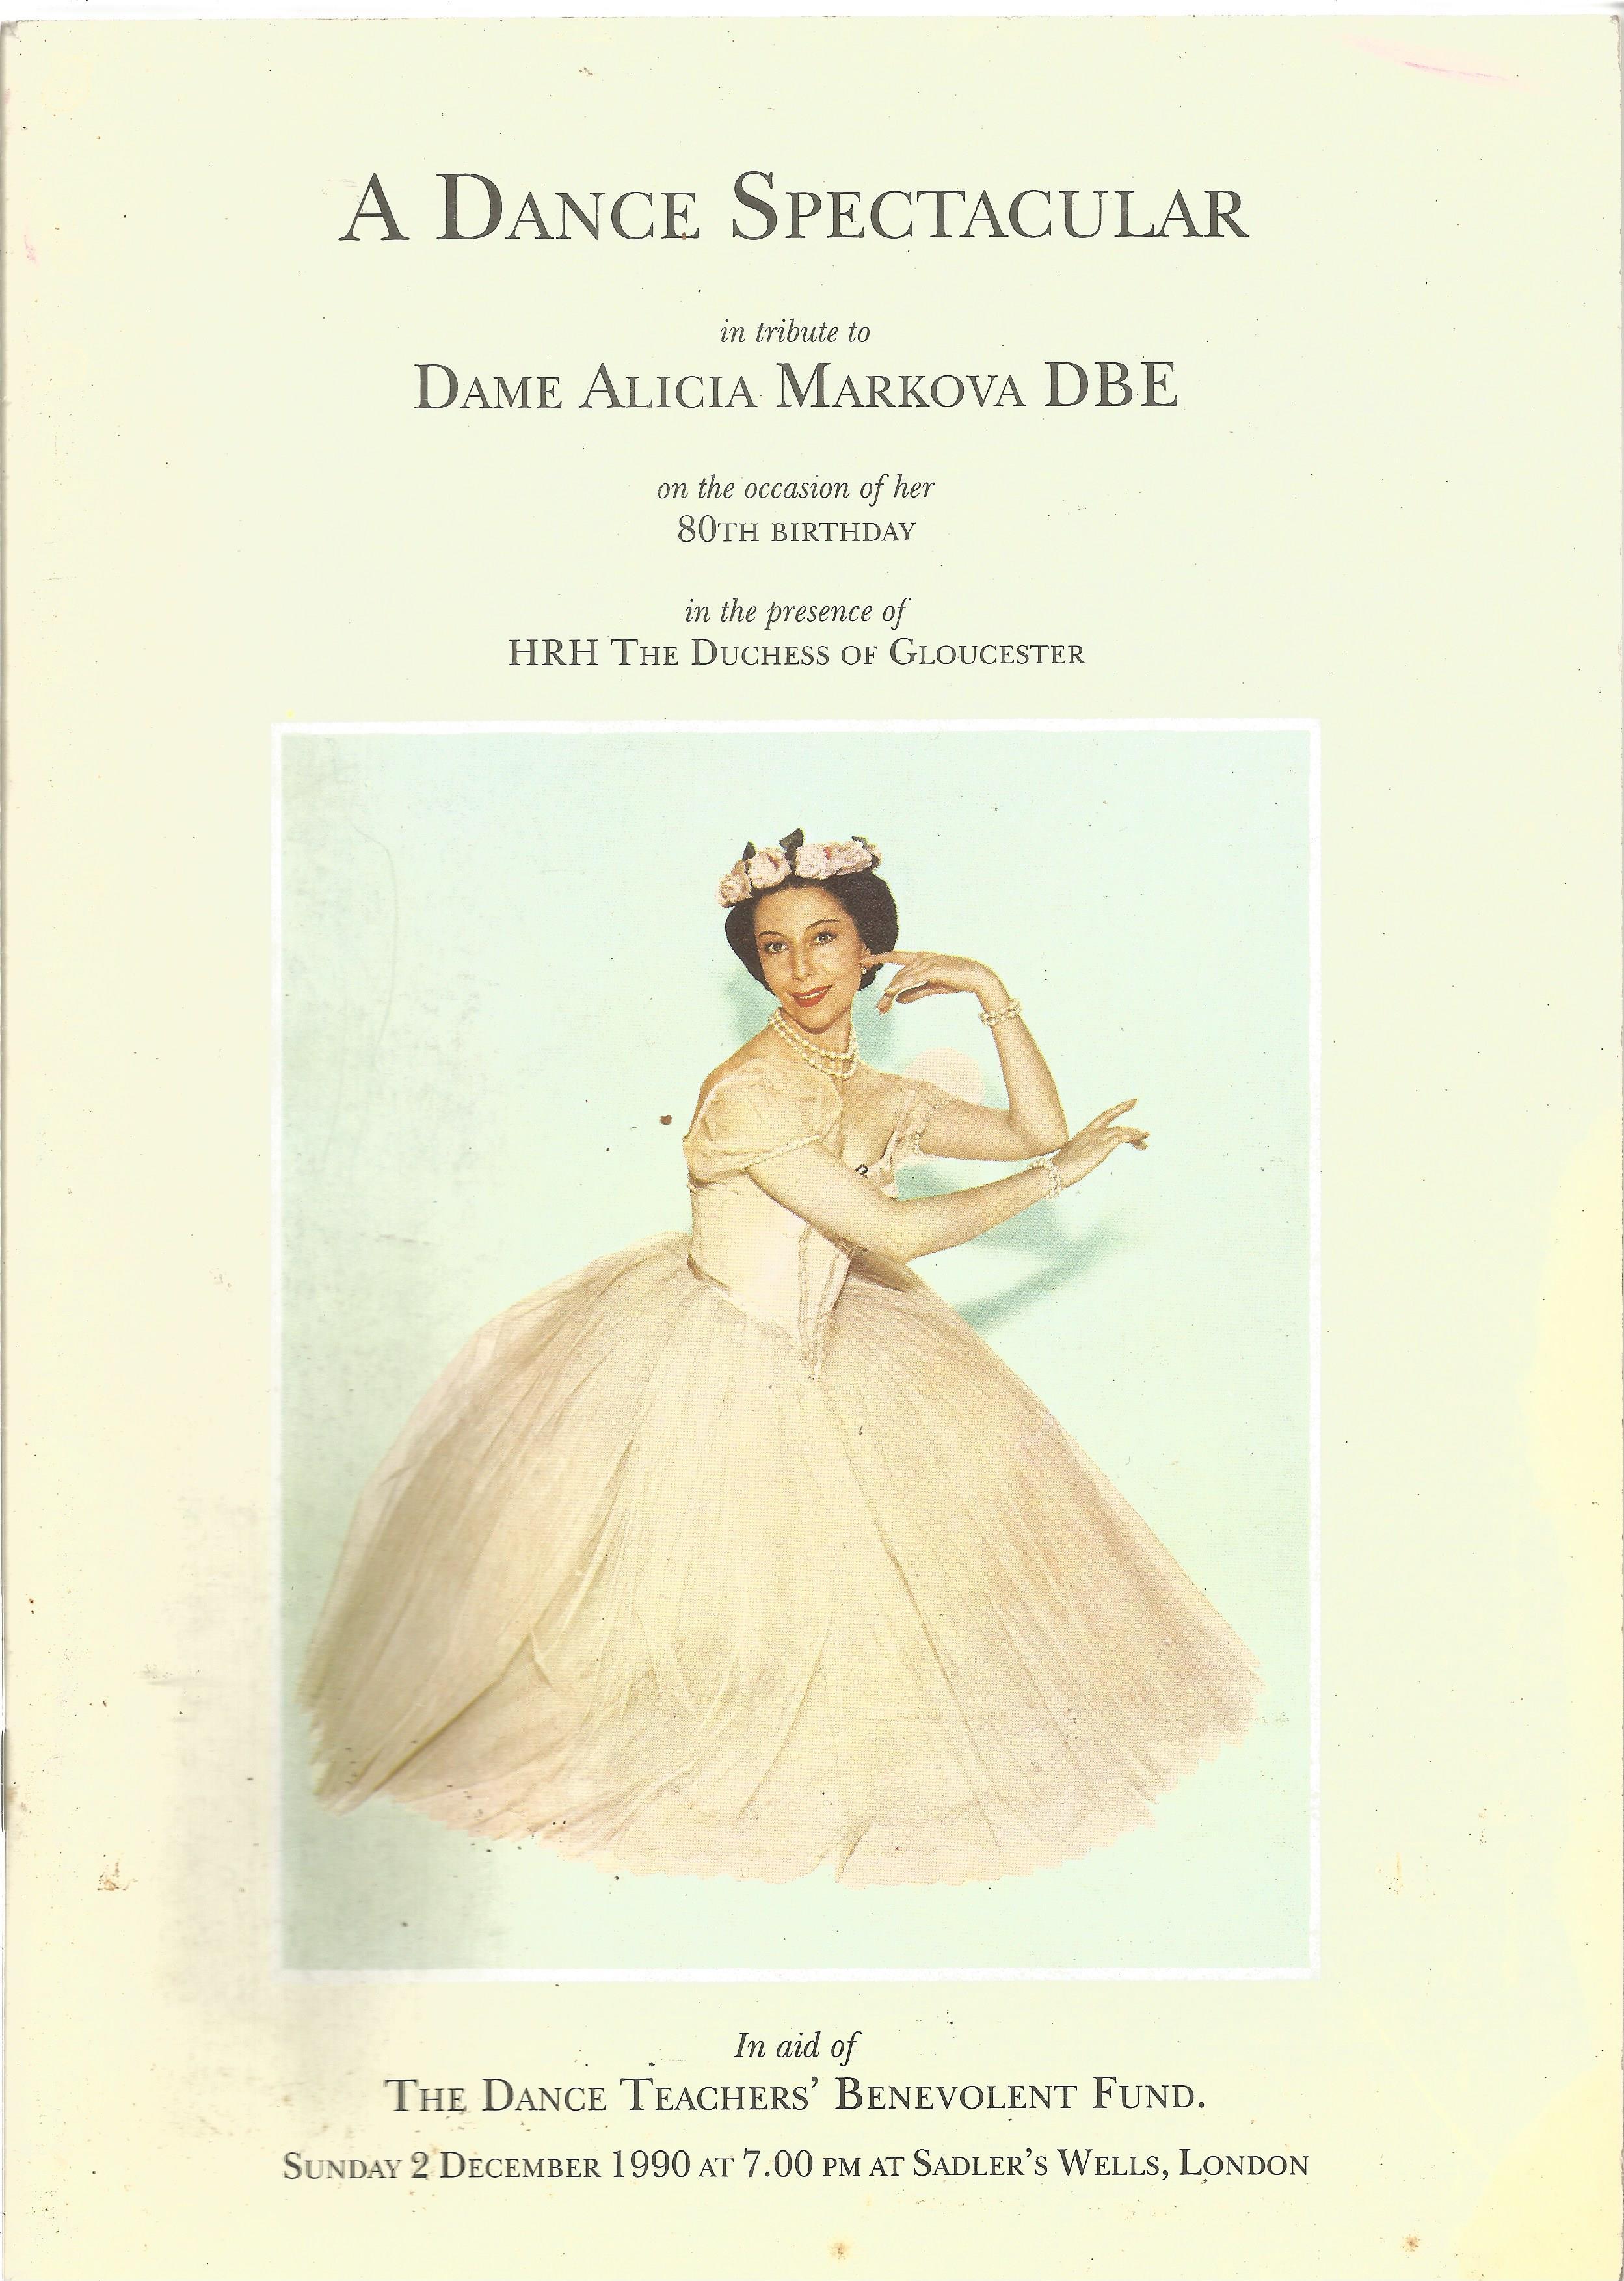 Opera in House Brochure A Dance Spectacular In Tribute to Dame Alicia Markova DBE 1990 Sadler's